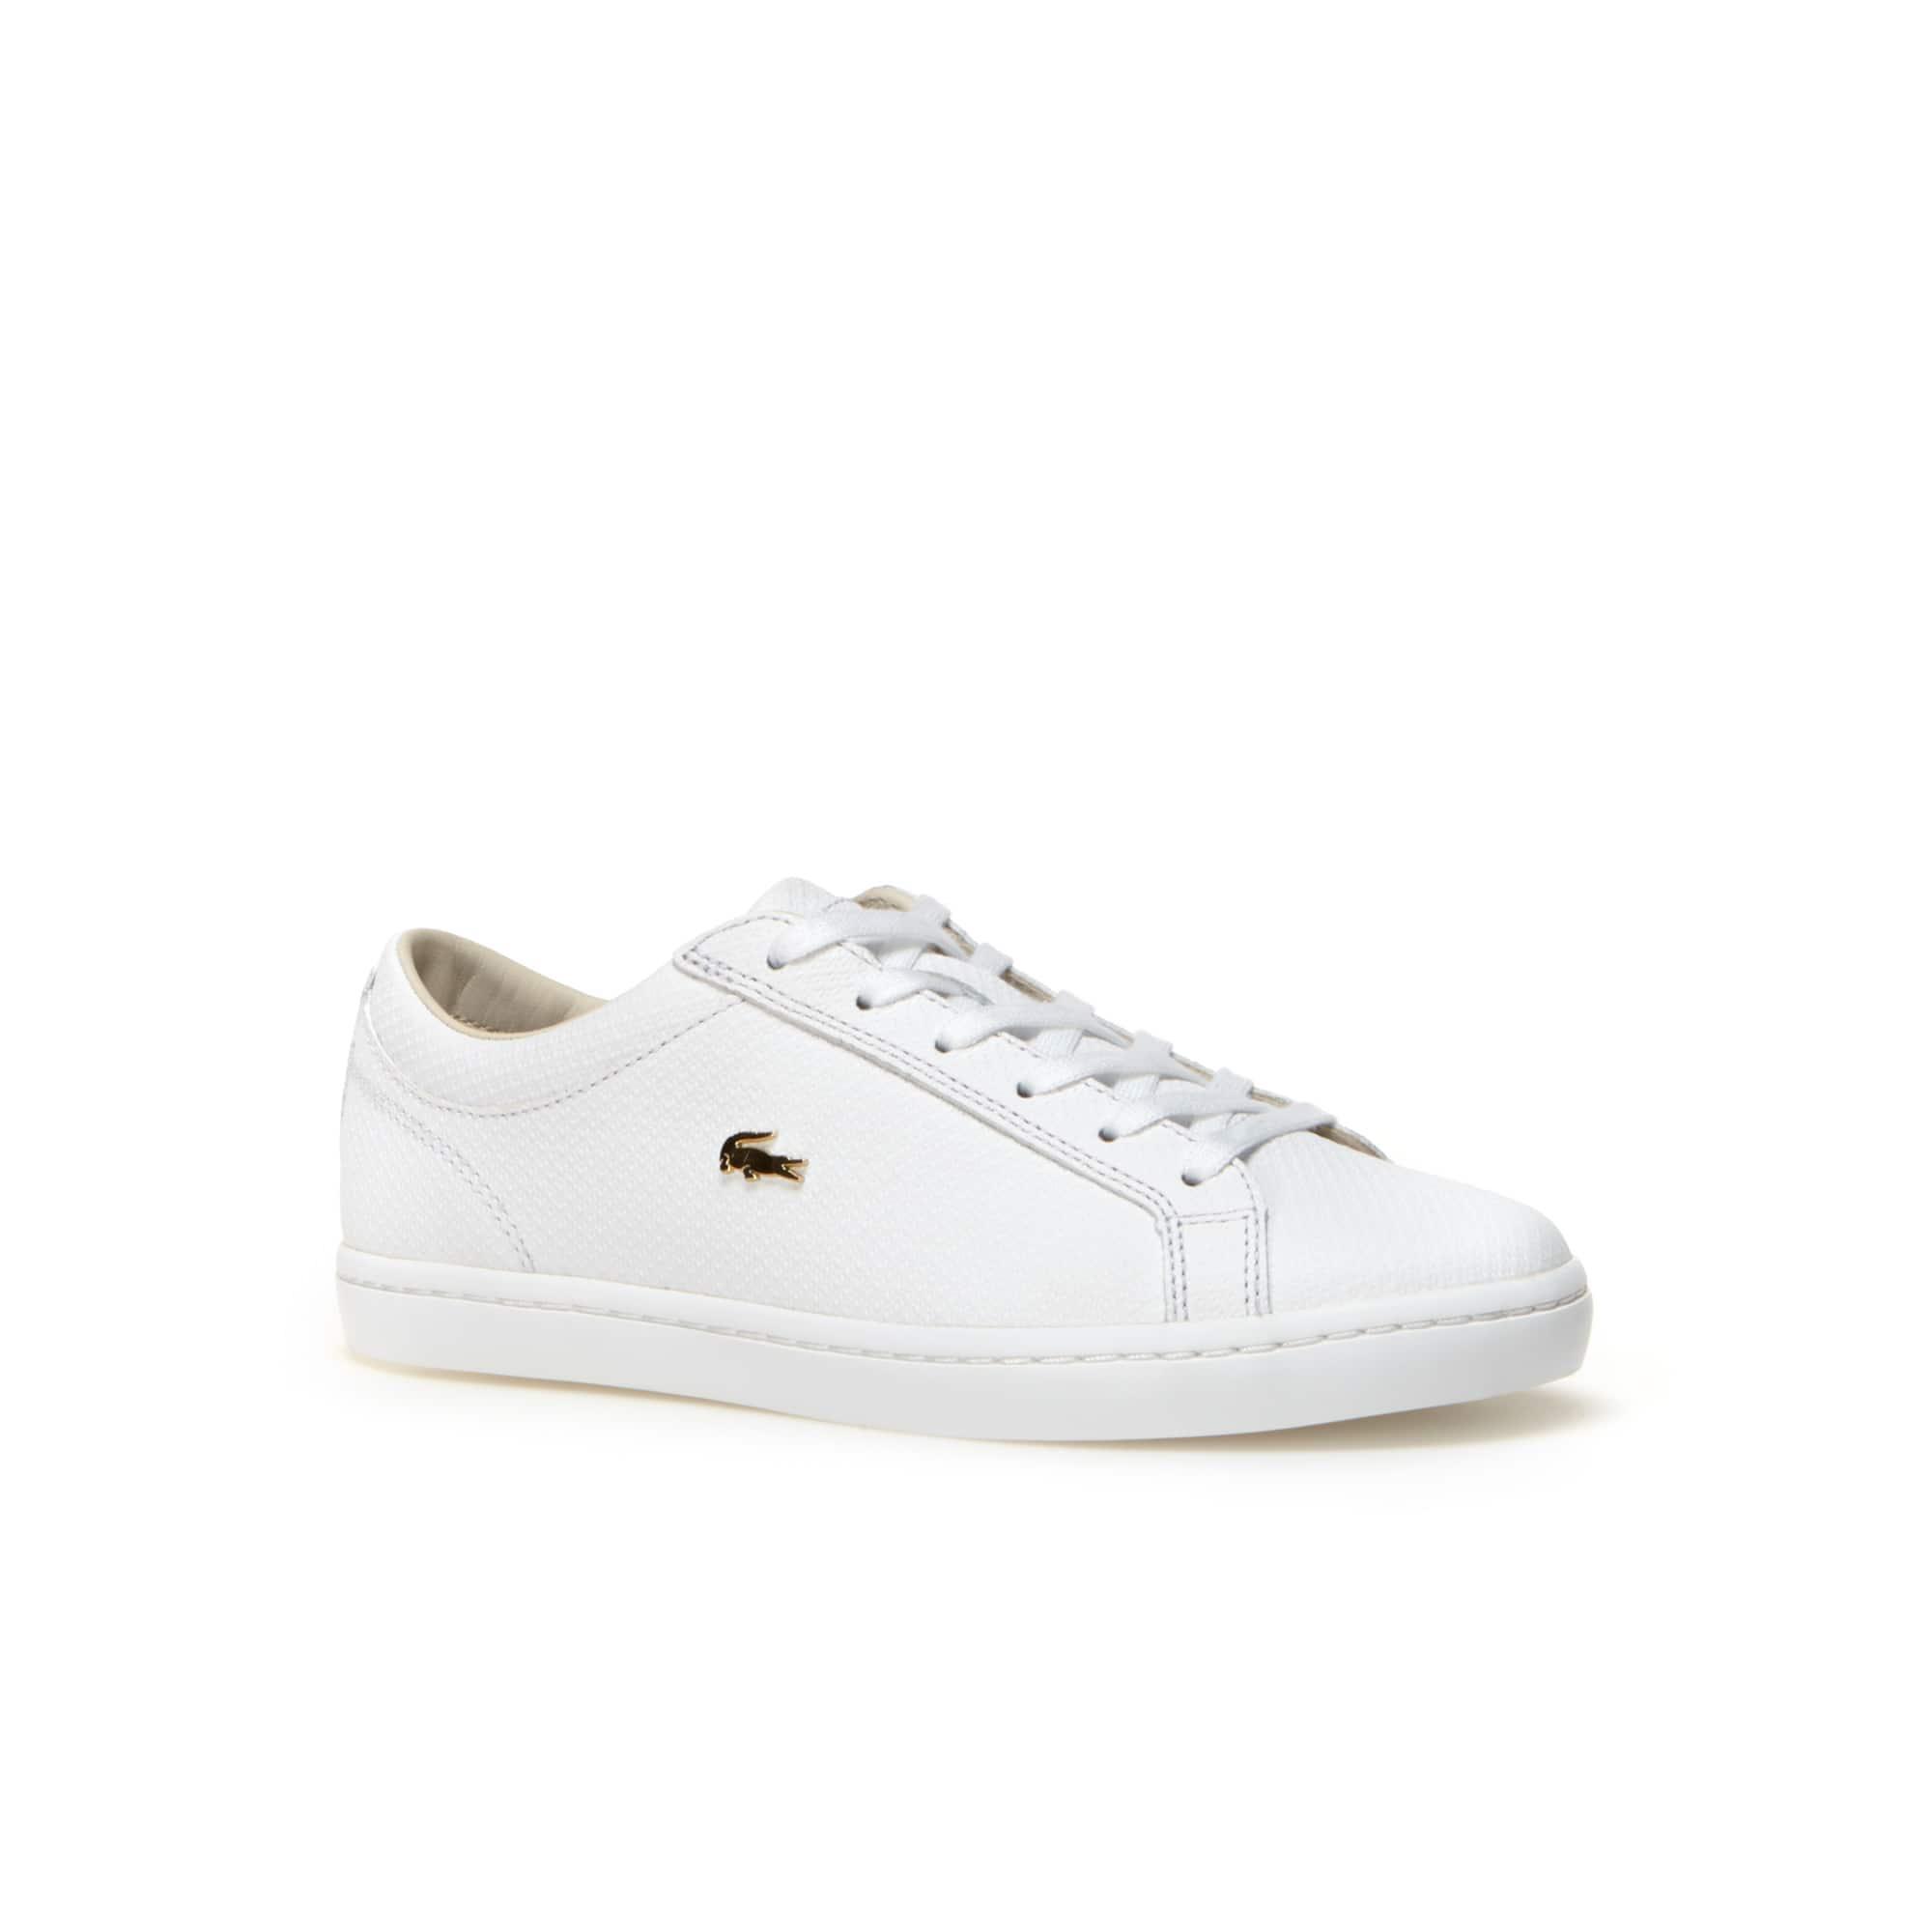 2e210e247cb1bc Damen-Sneaker aus Leder mit goldfarbenem Krokodil STRAIGHTSET